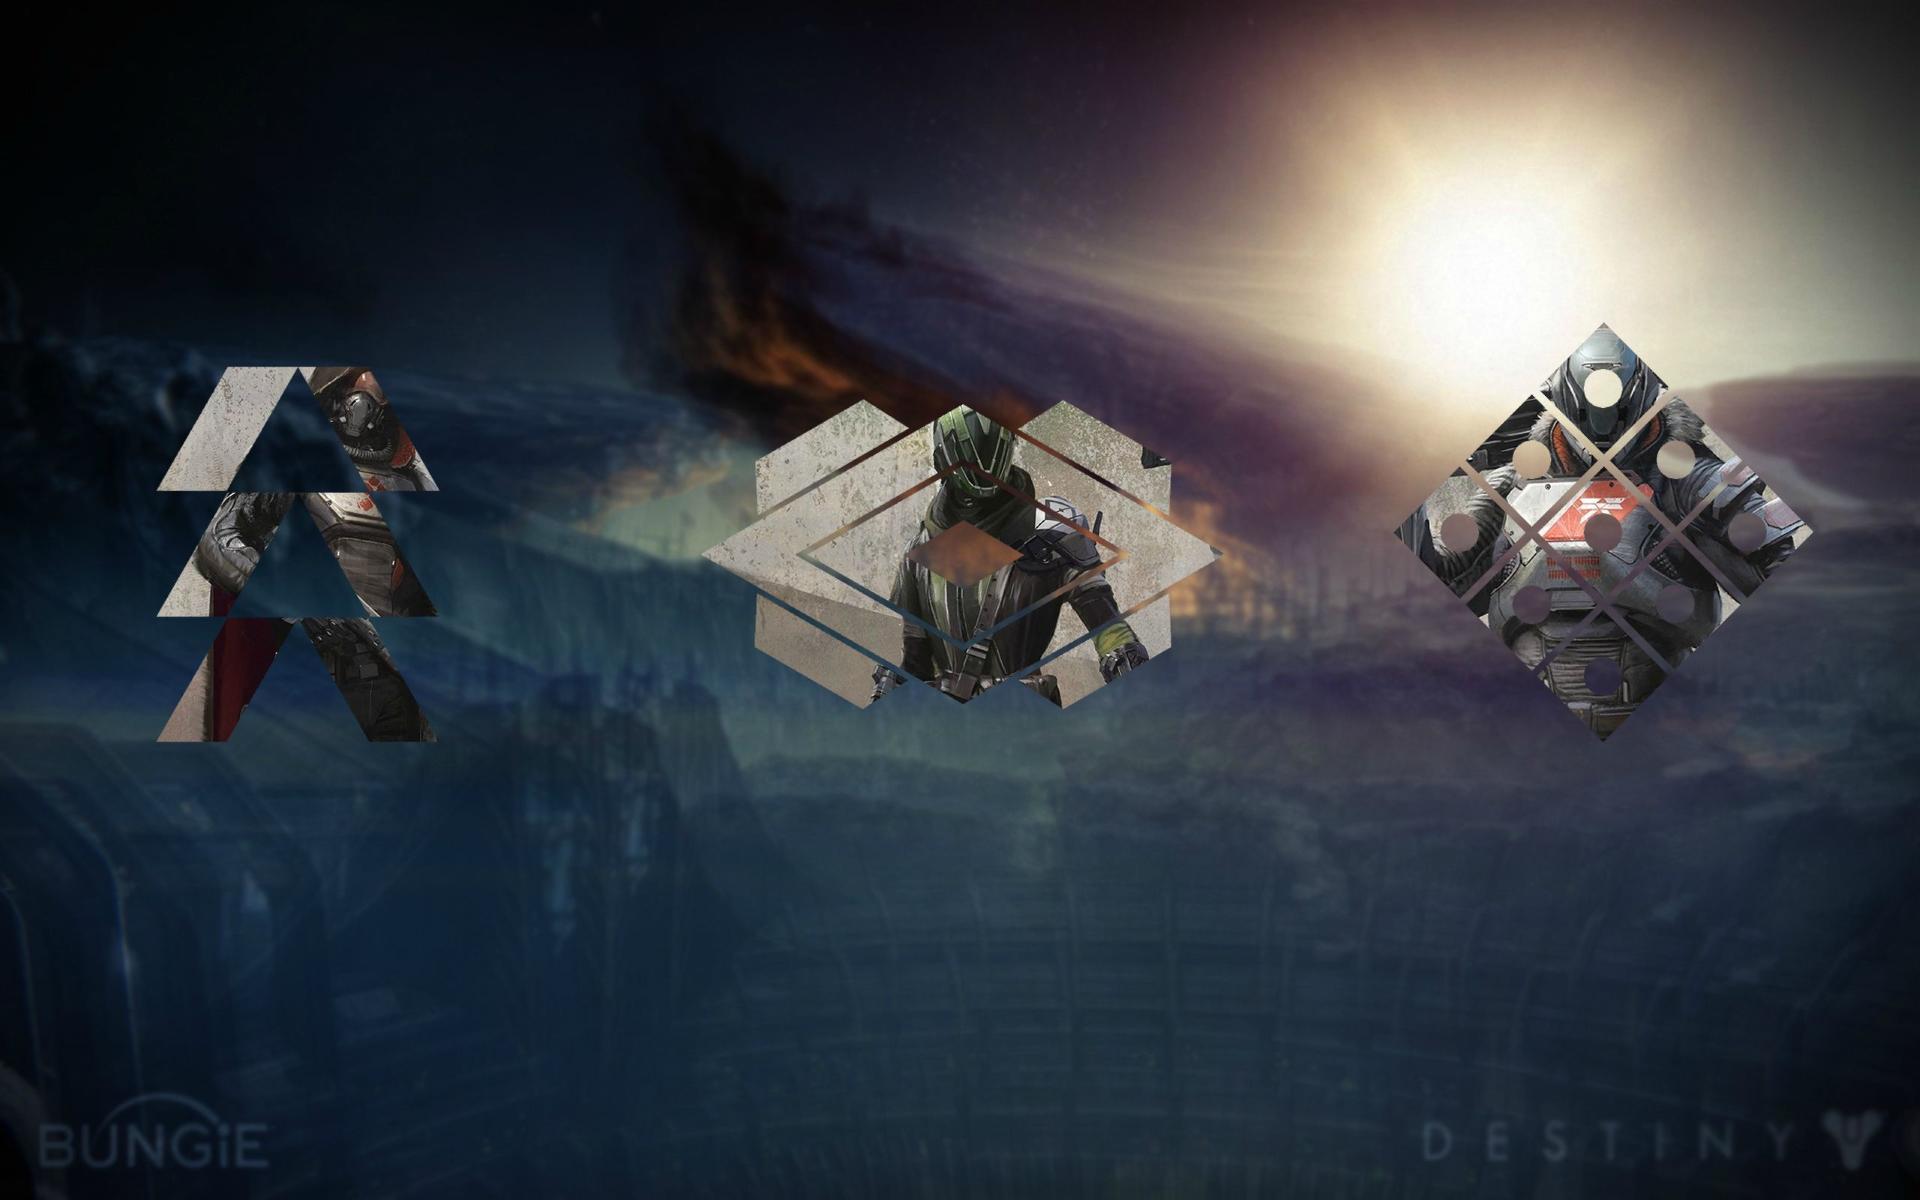 30 Destiny Wallpapers For Desktop In Hd Free Download